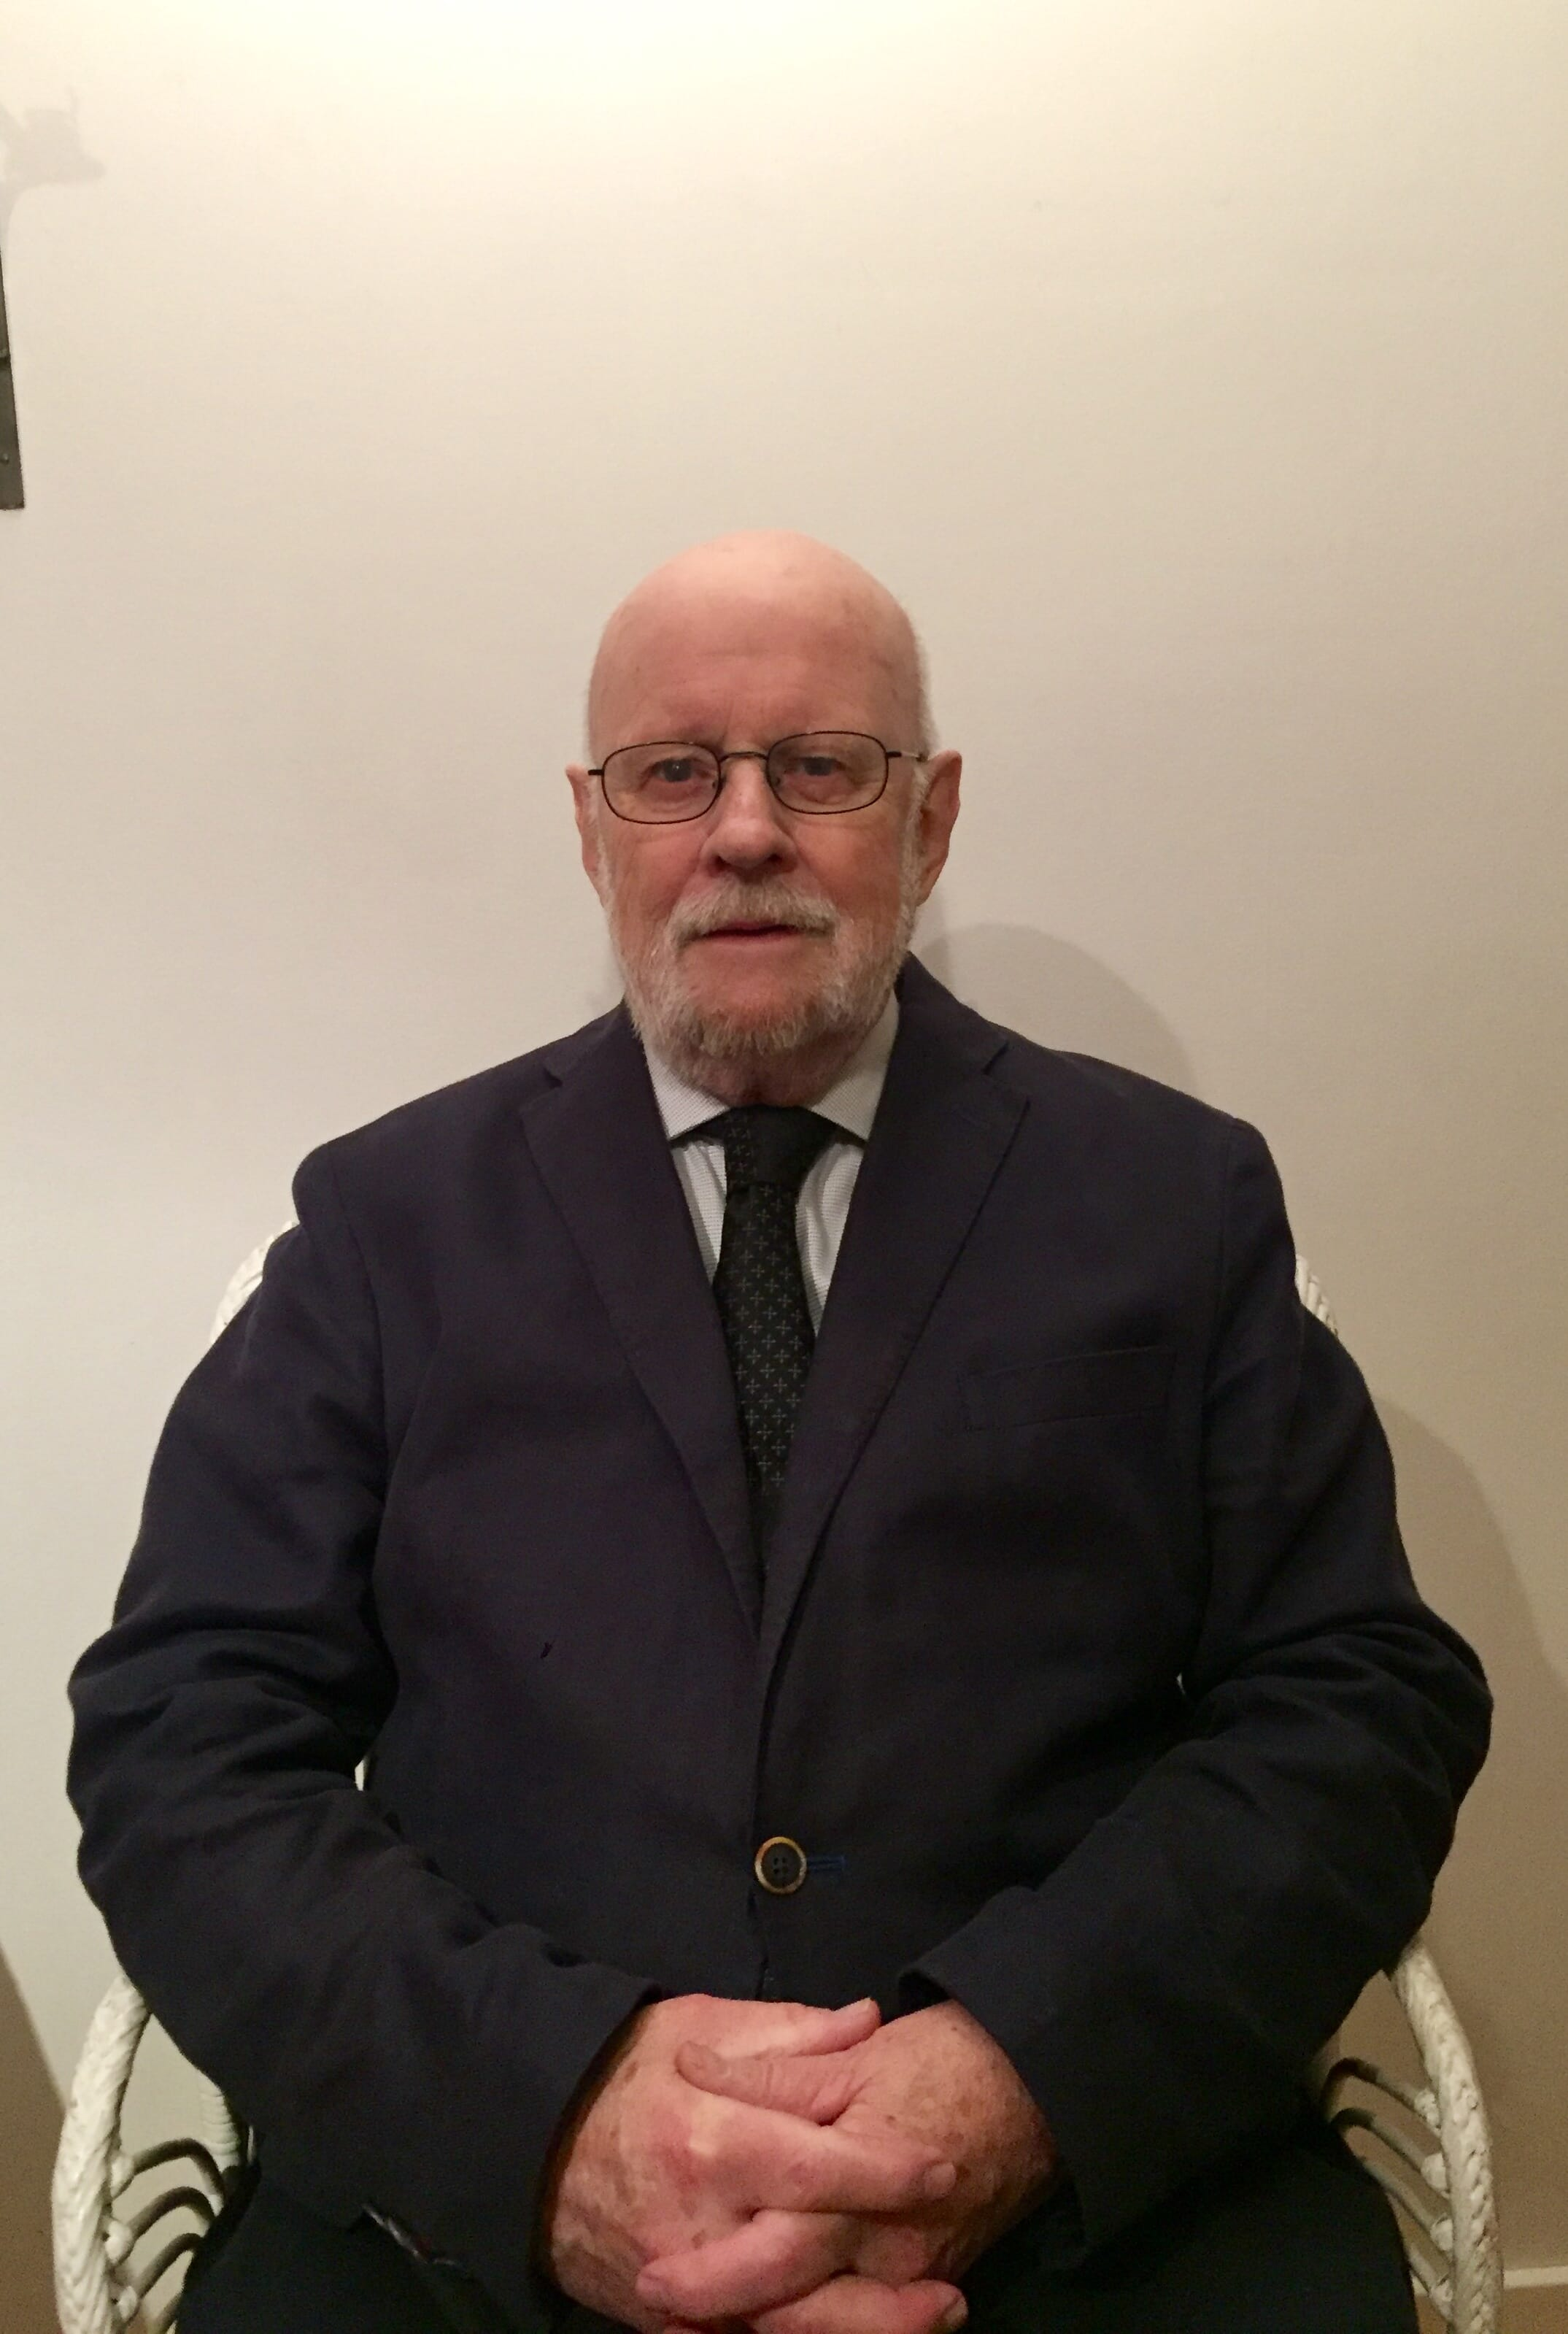 Rolf Strömberg